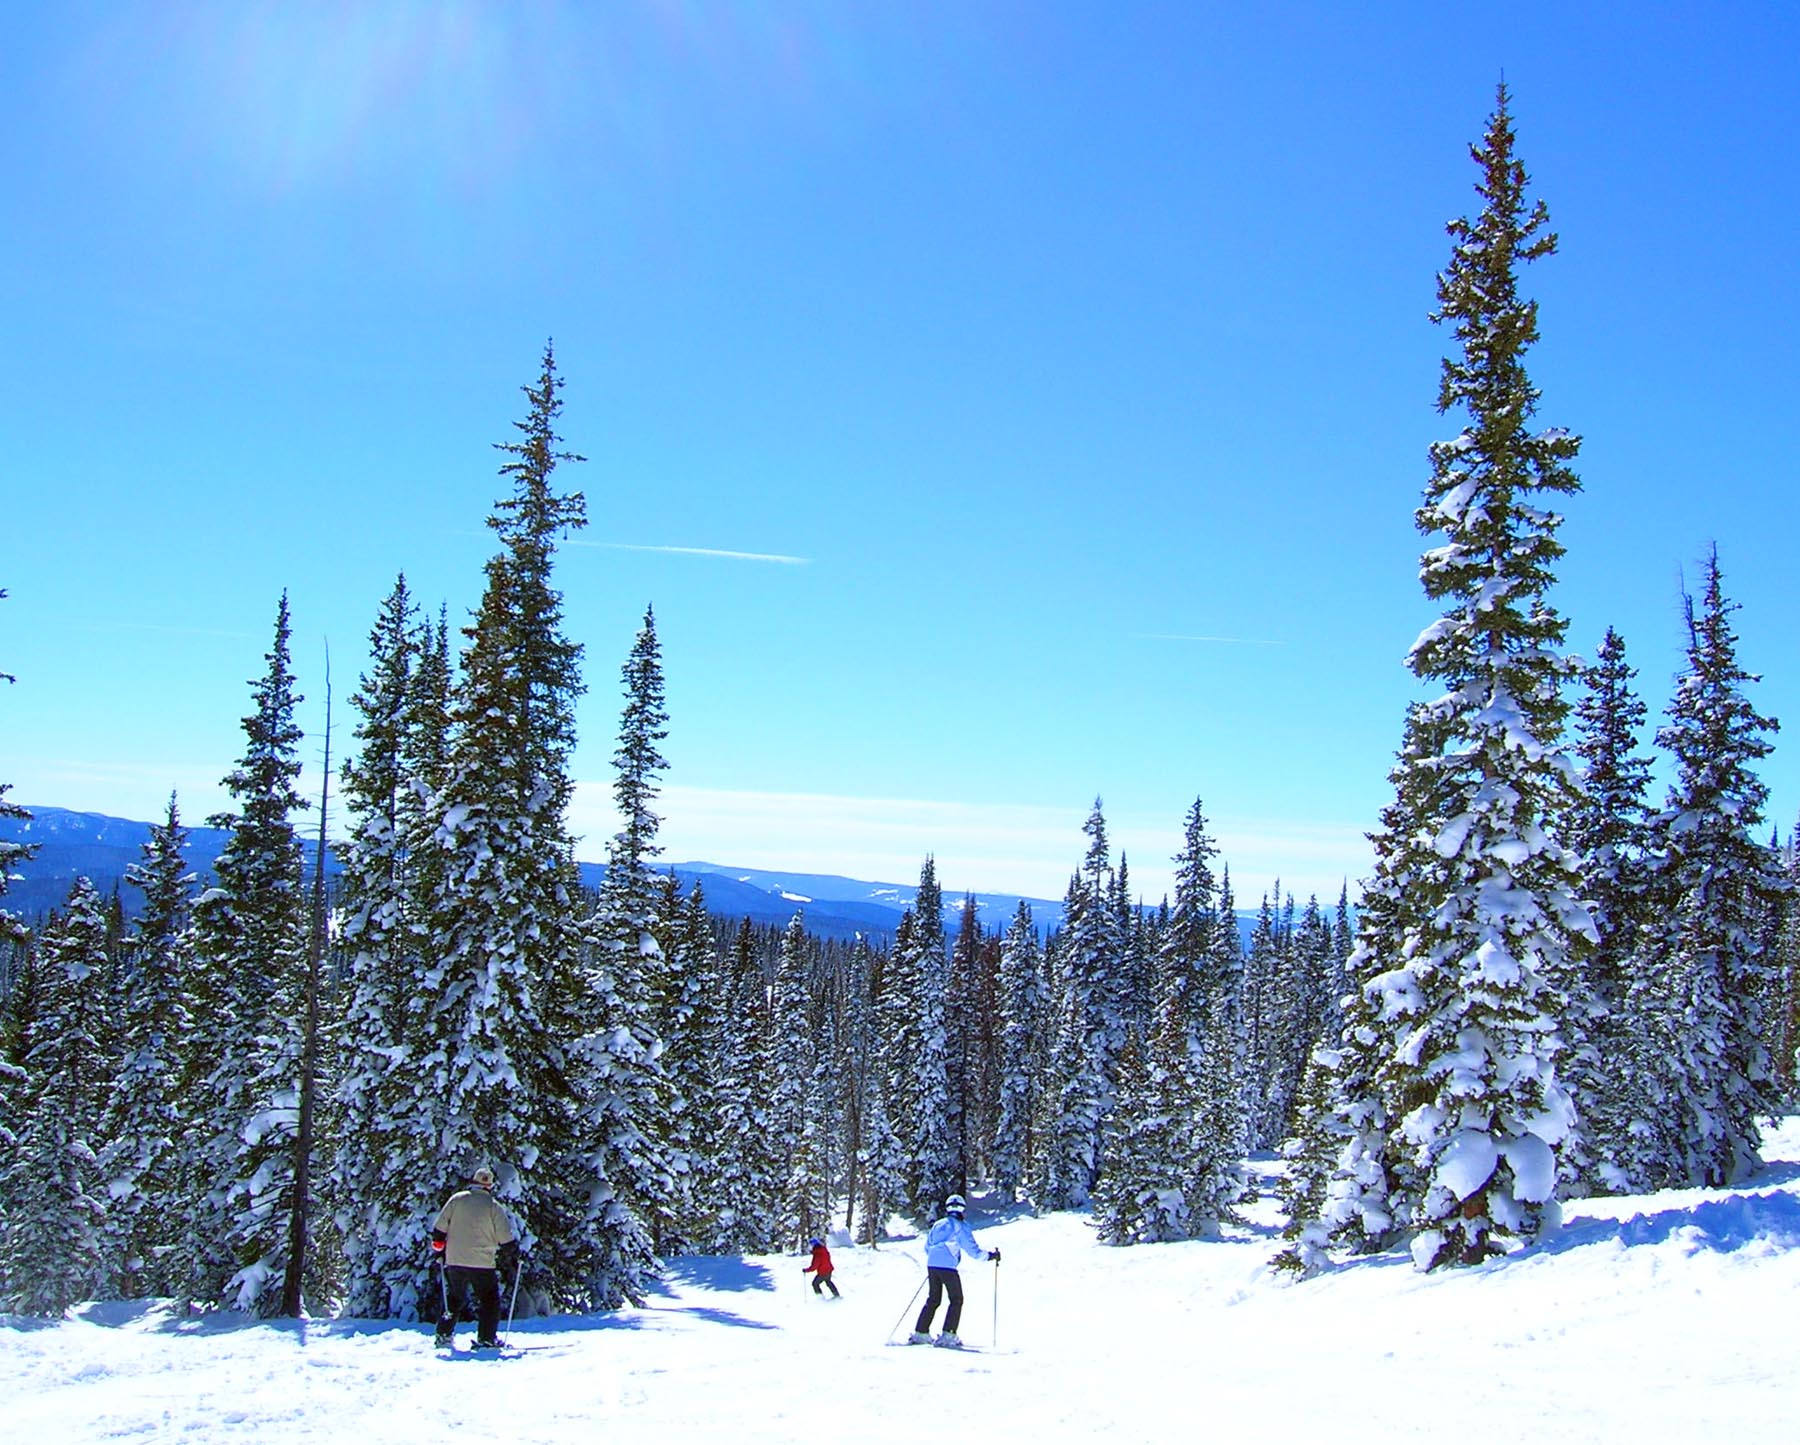 steamboat-snow-trees-ski-colorado